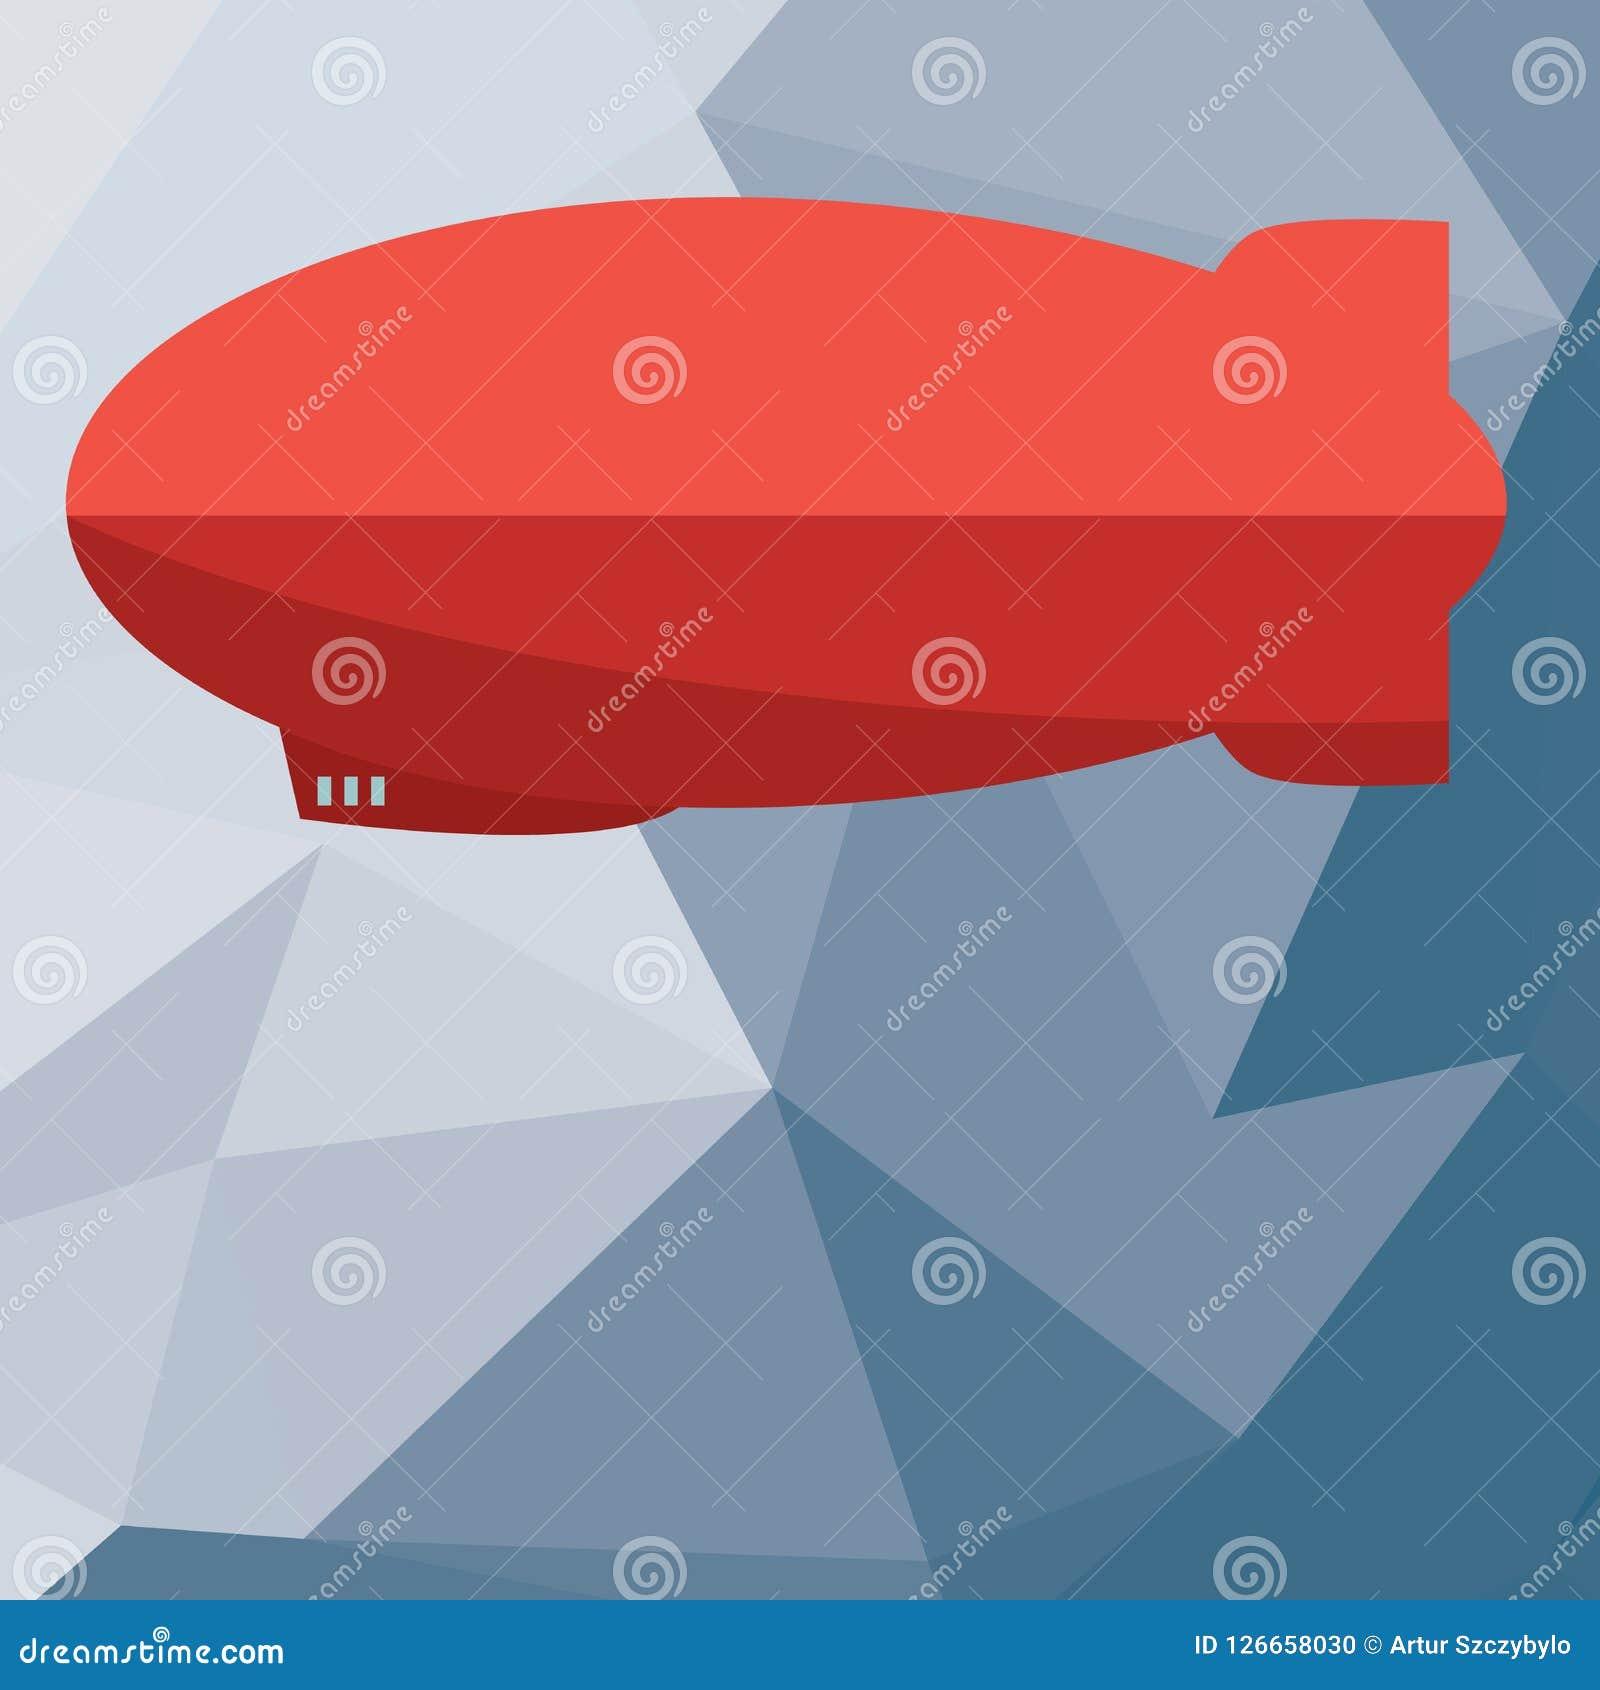 Flat Design Business Vector Illustration Concept Empty